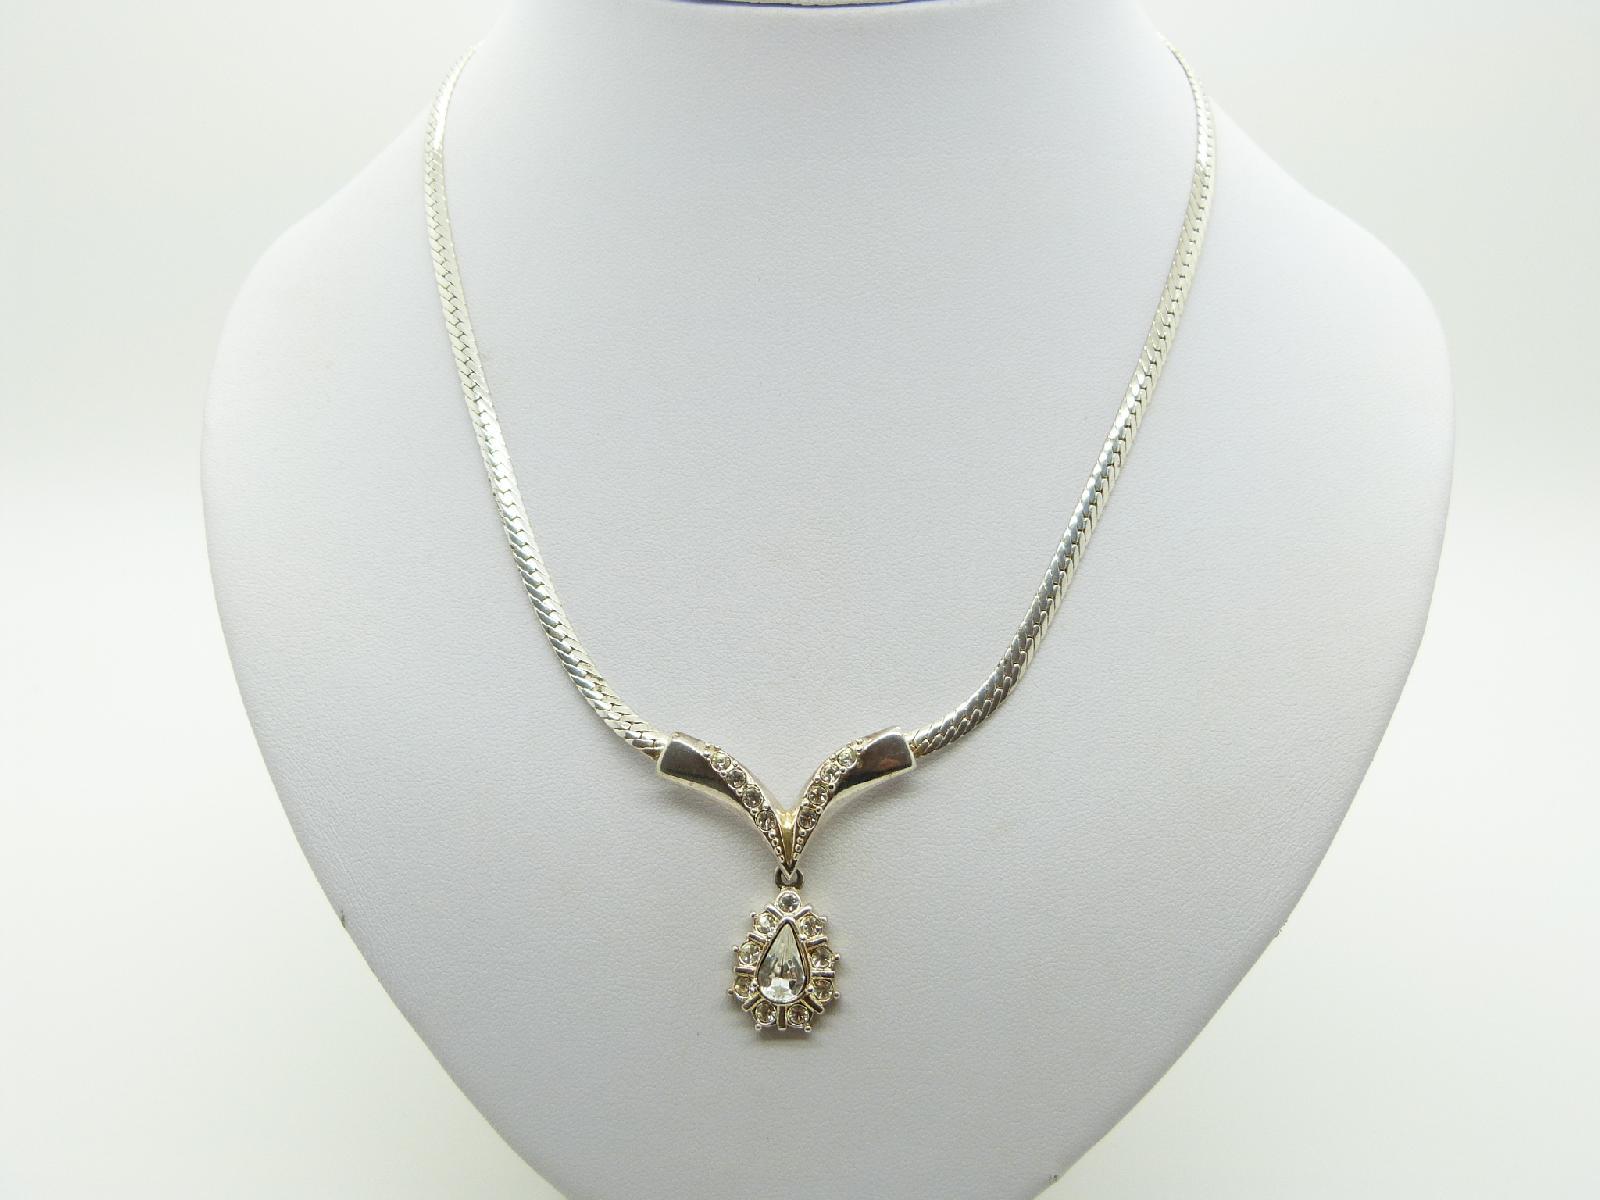 £12.00 - Vintage 80s Pretty Silvertone Snake Chain Diamante Dropper Pendant Necklace